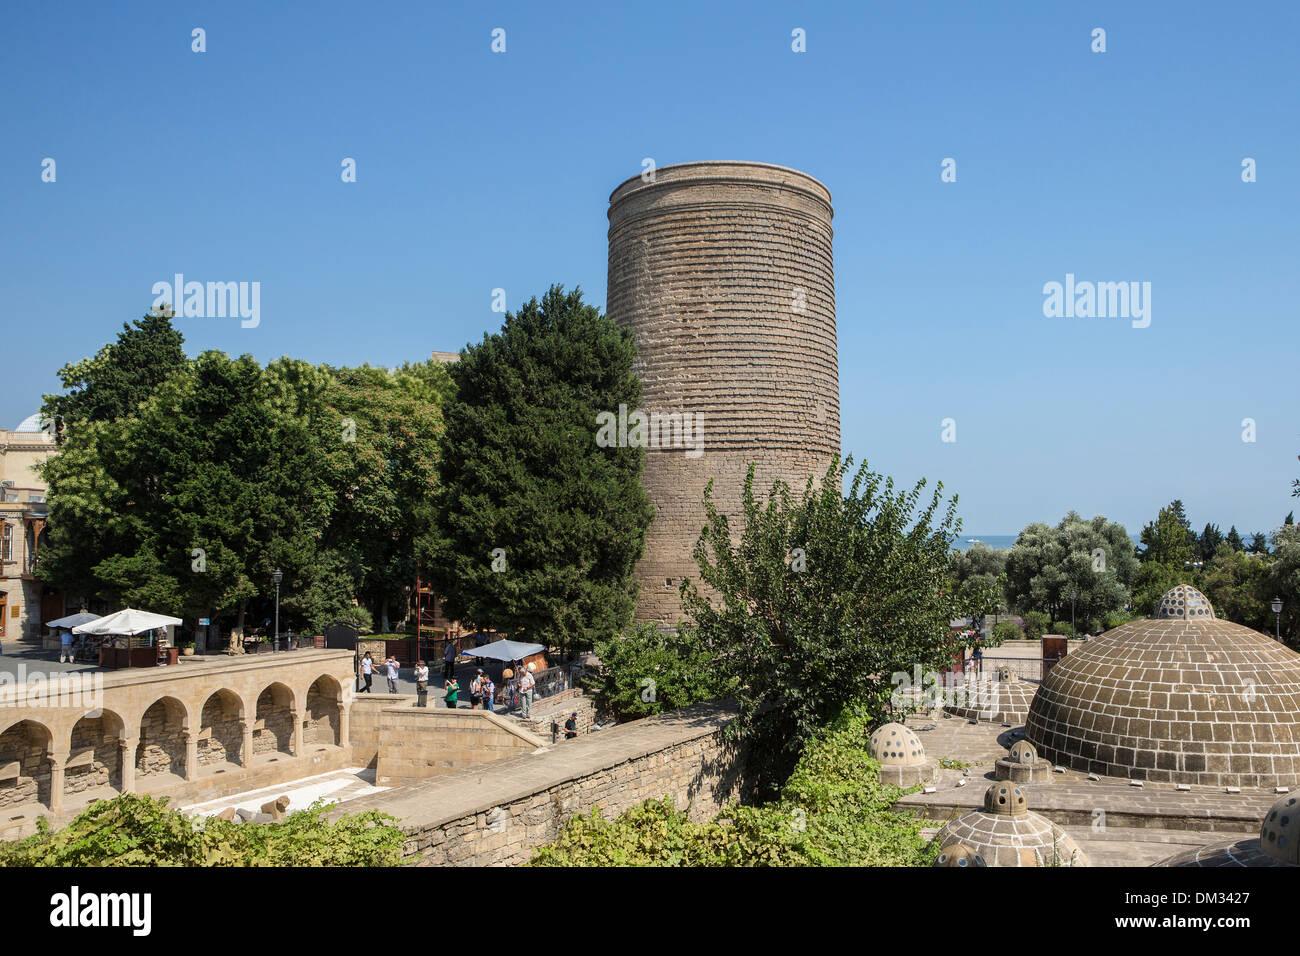 world heritage Azerbaijan Caucasus Eurasia Baku City Bazaar Maiden Old Baku Tower architecture city history historical - Stock Image